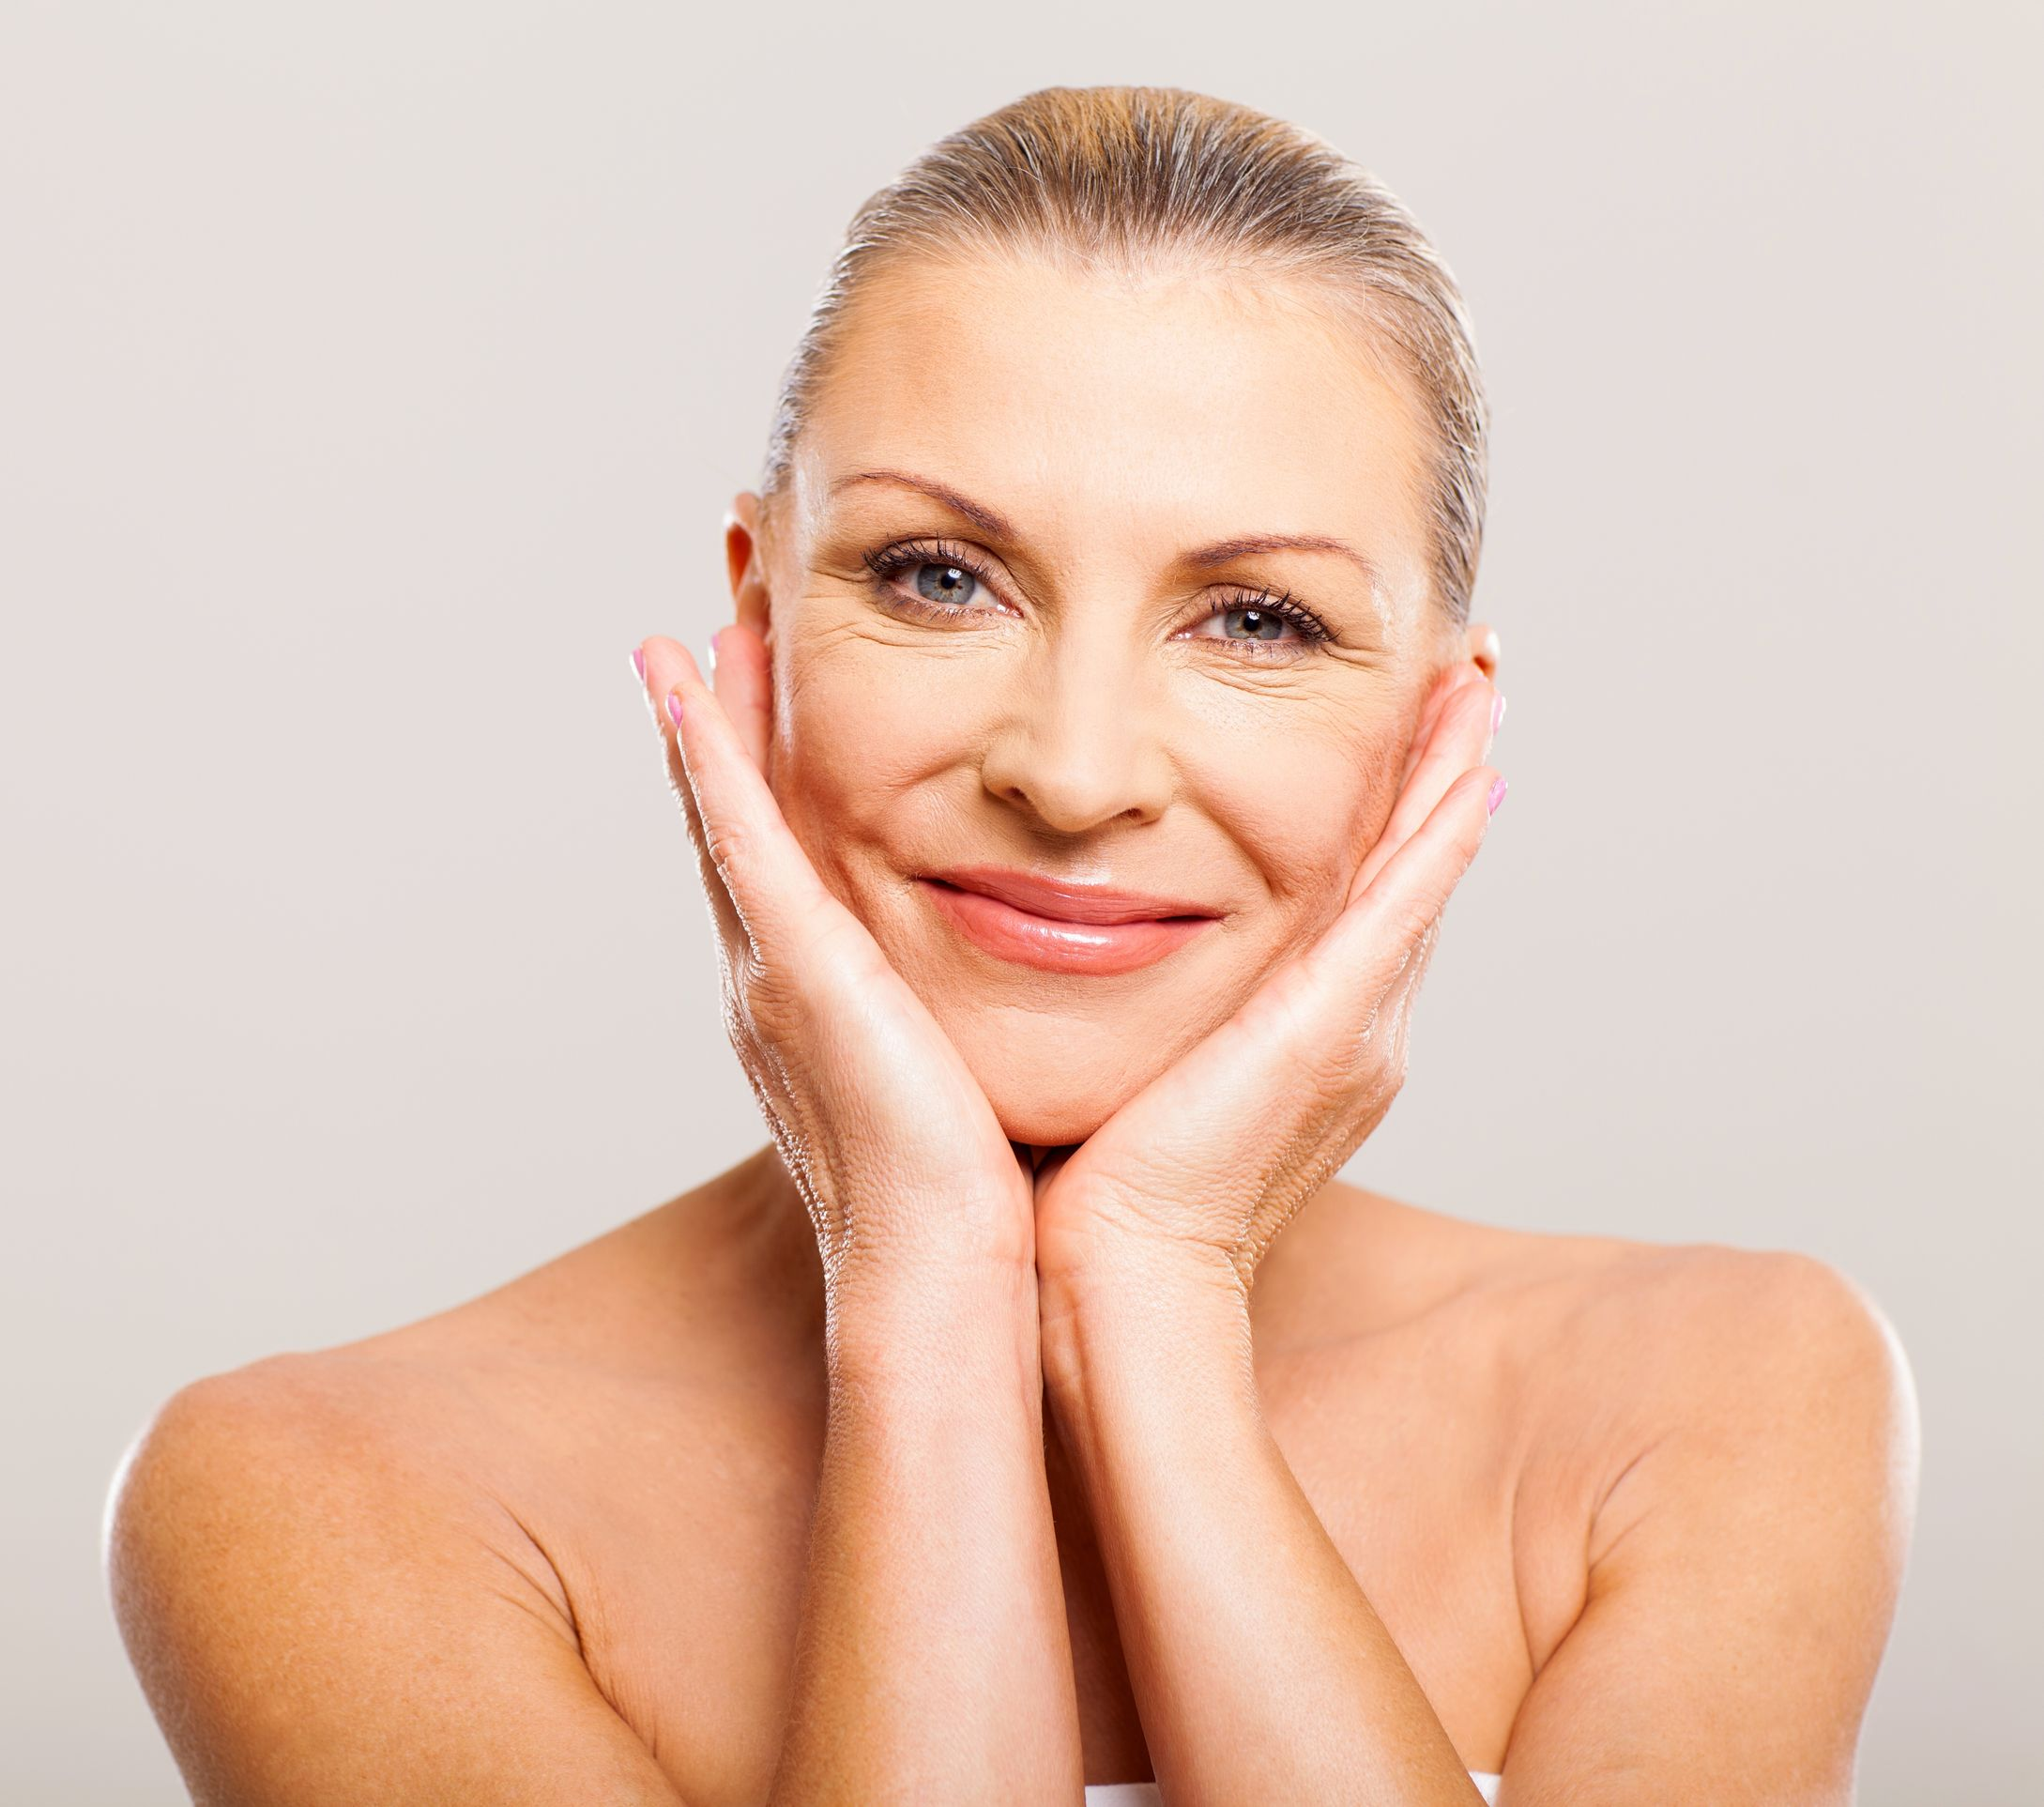 The HydraFacial: Advanced Facial Plus Targeted Skin Treatment